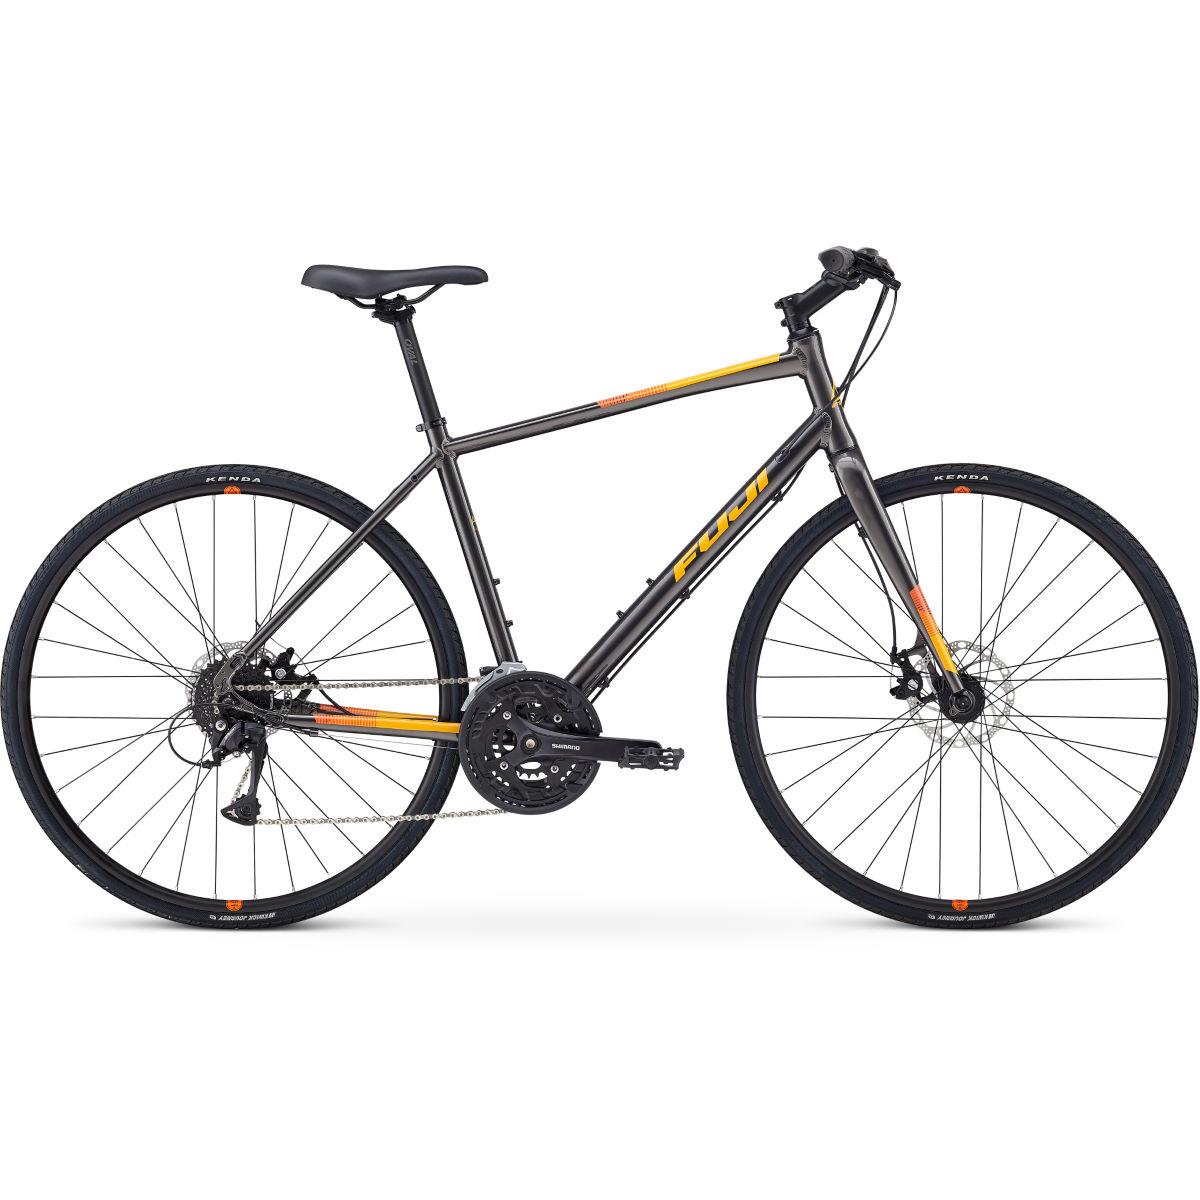 Fuji Absolute 1.7 2019 Bikes